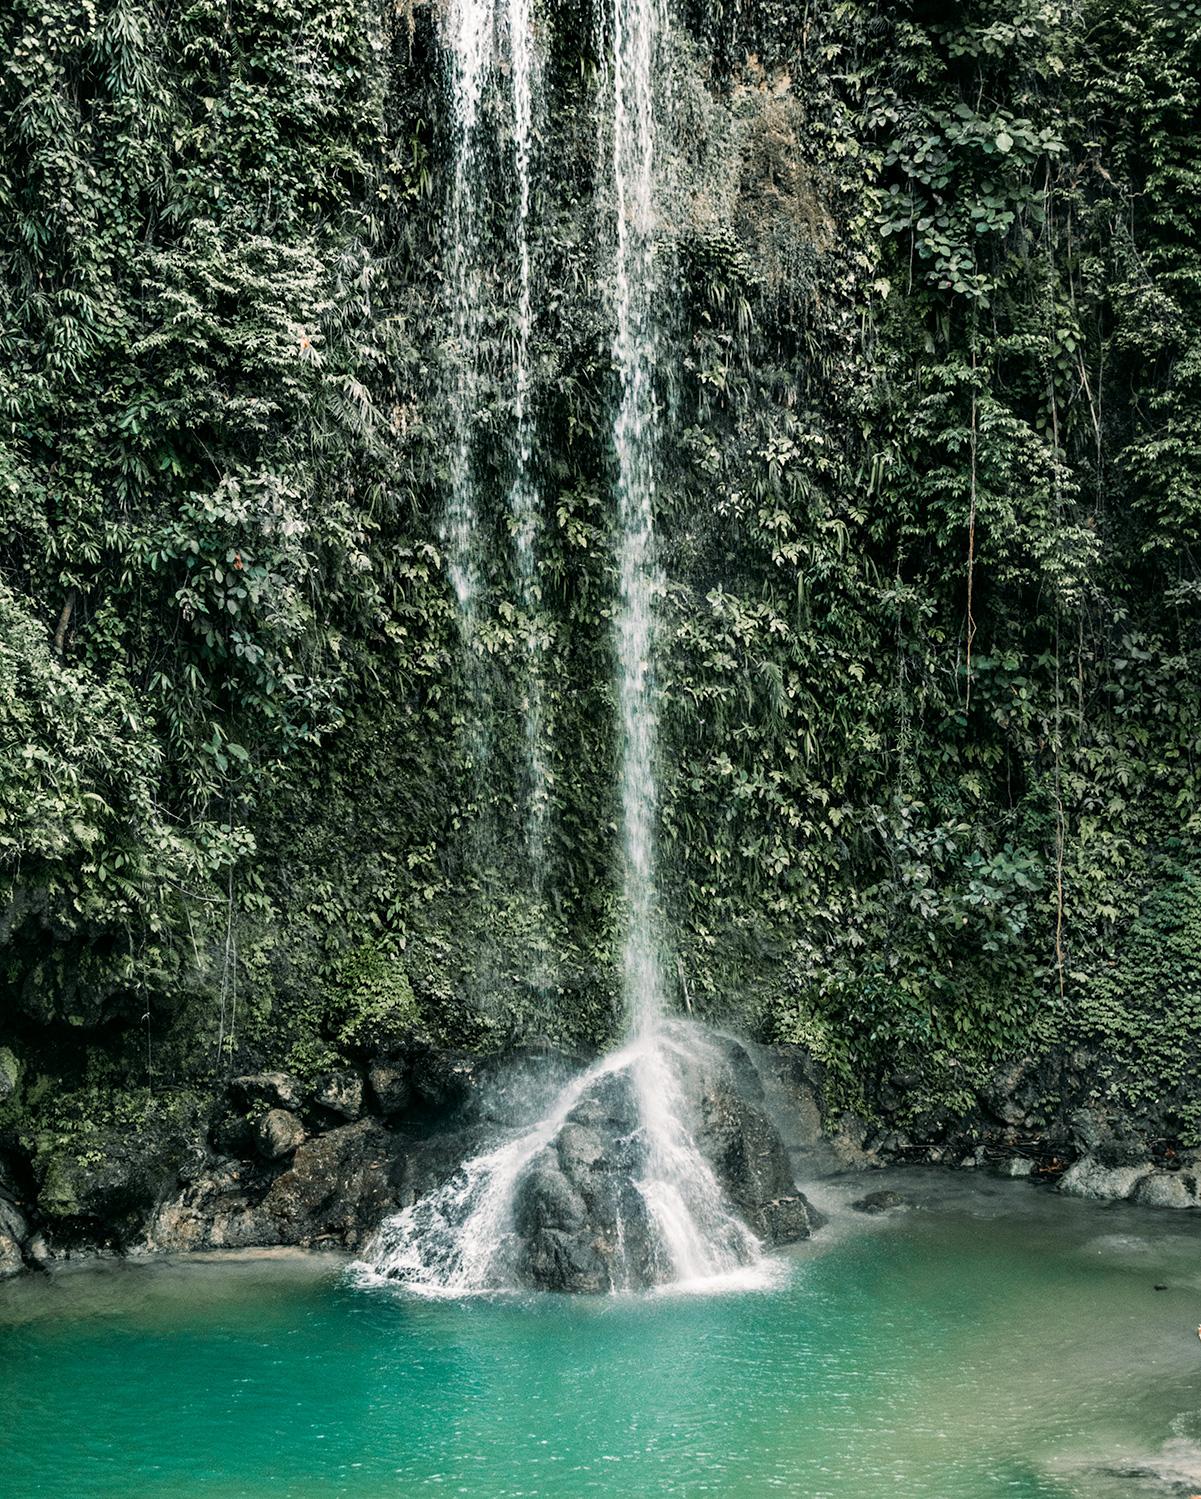 cebu waterfall guide adventure starts here philippines asia amazing beautiful nature forest green blue